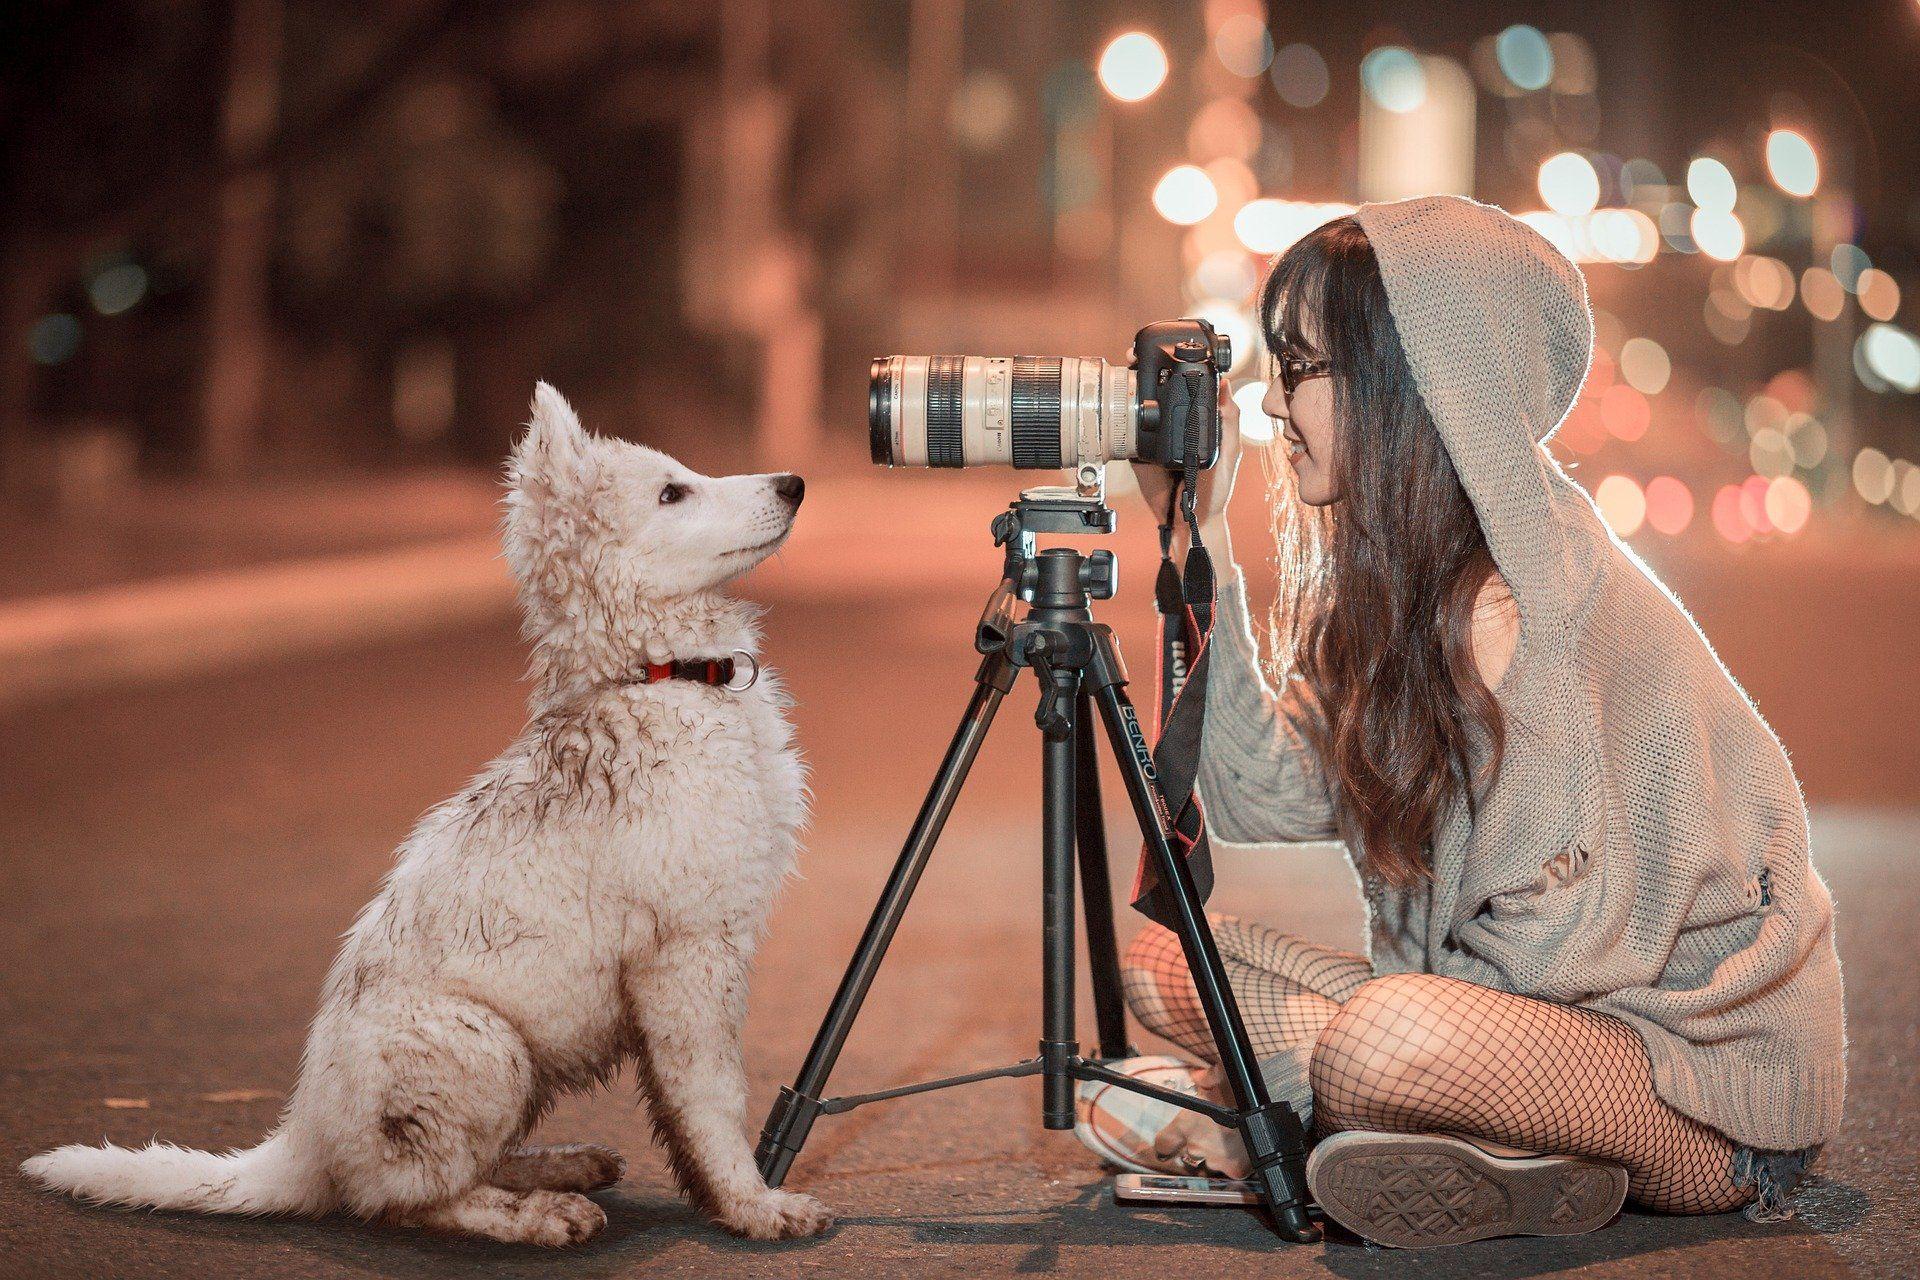 Find good photos